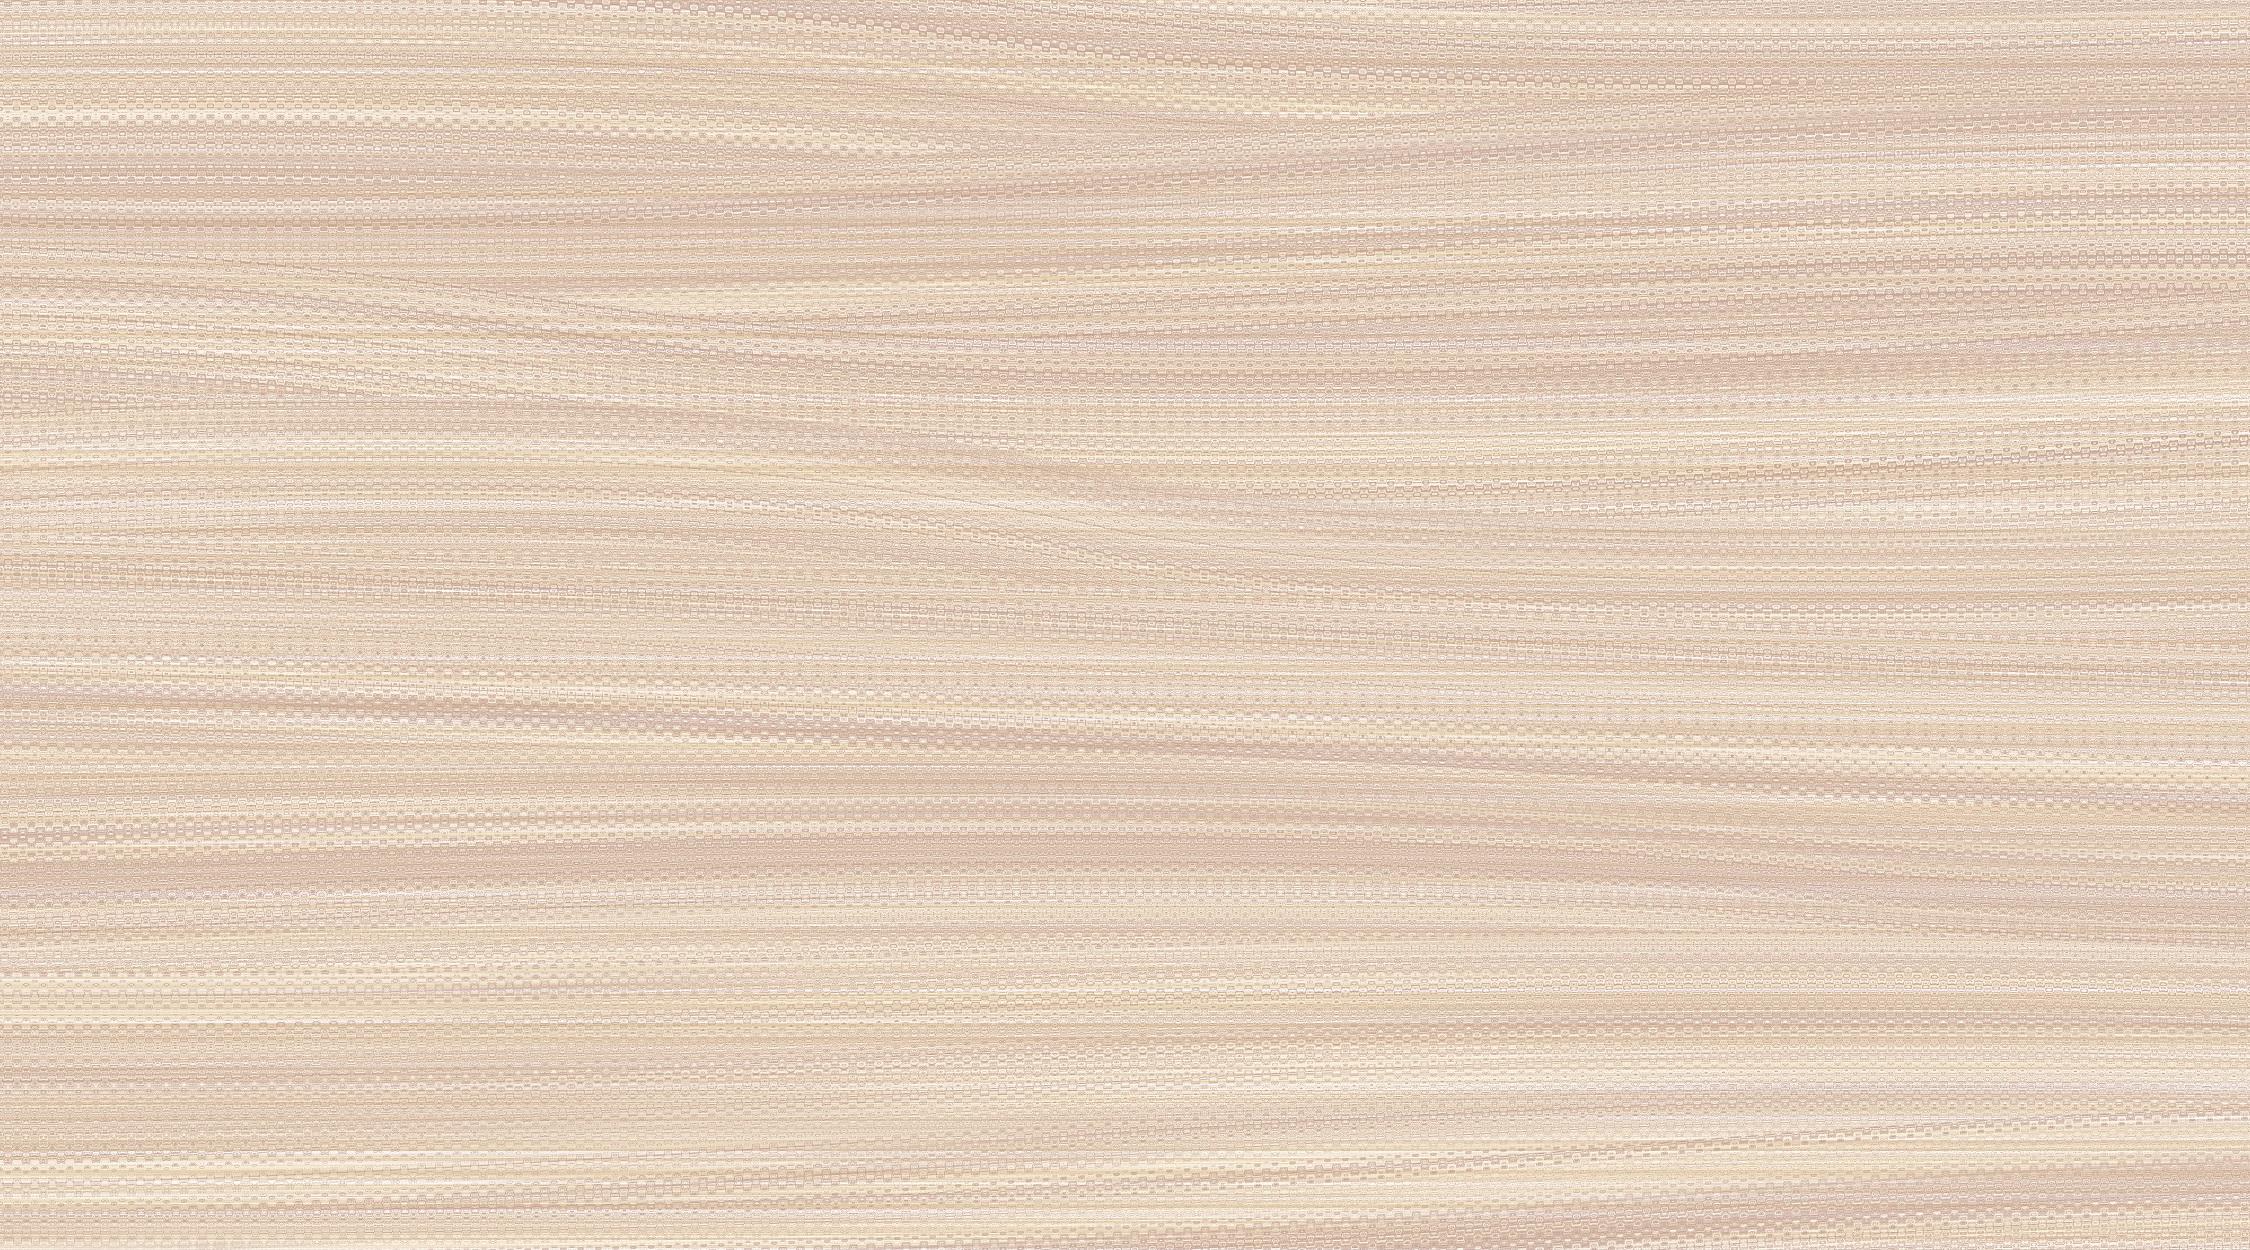 Плитка облицовочная Globaltile 1045-0078 aroma бежевый 13шт